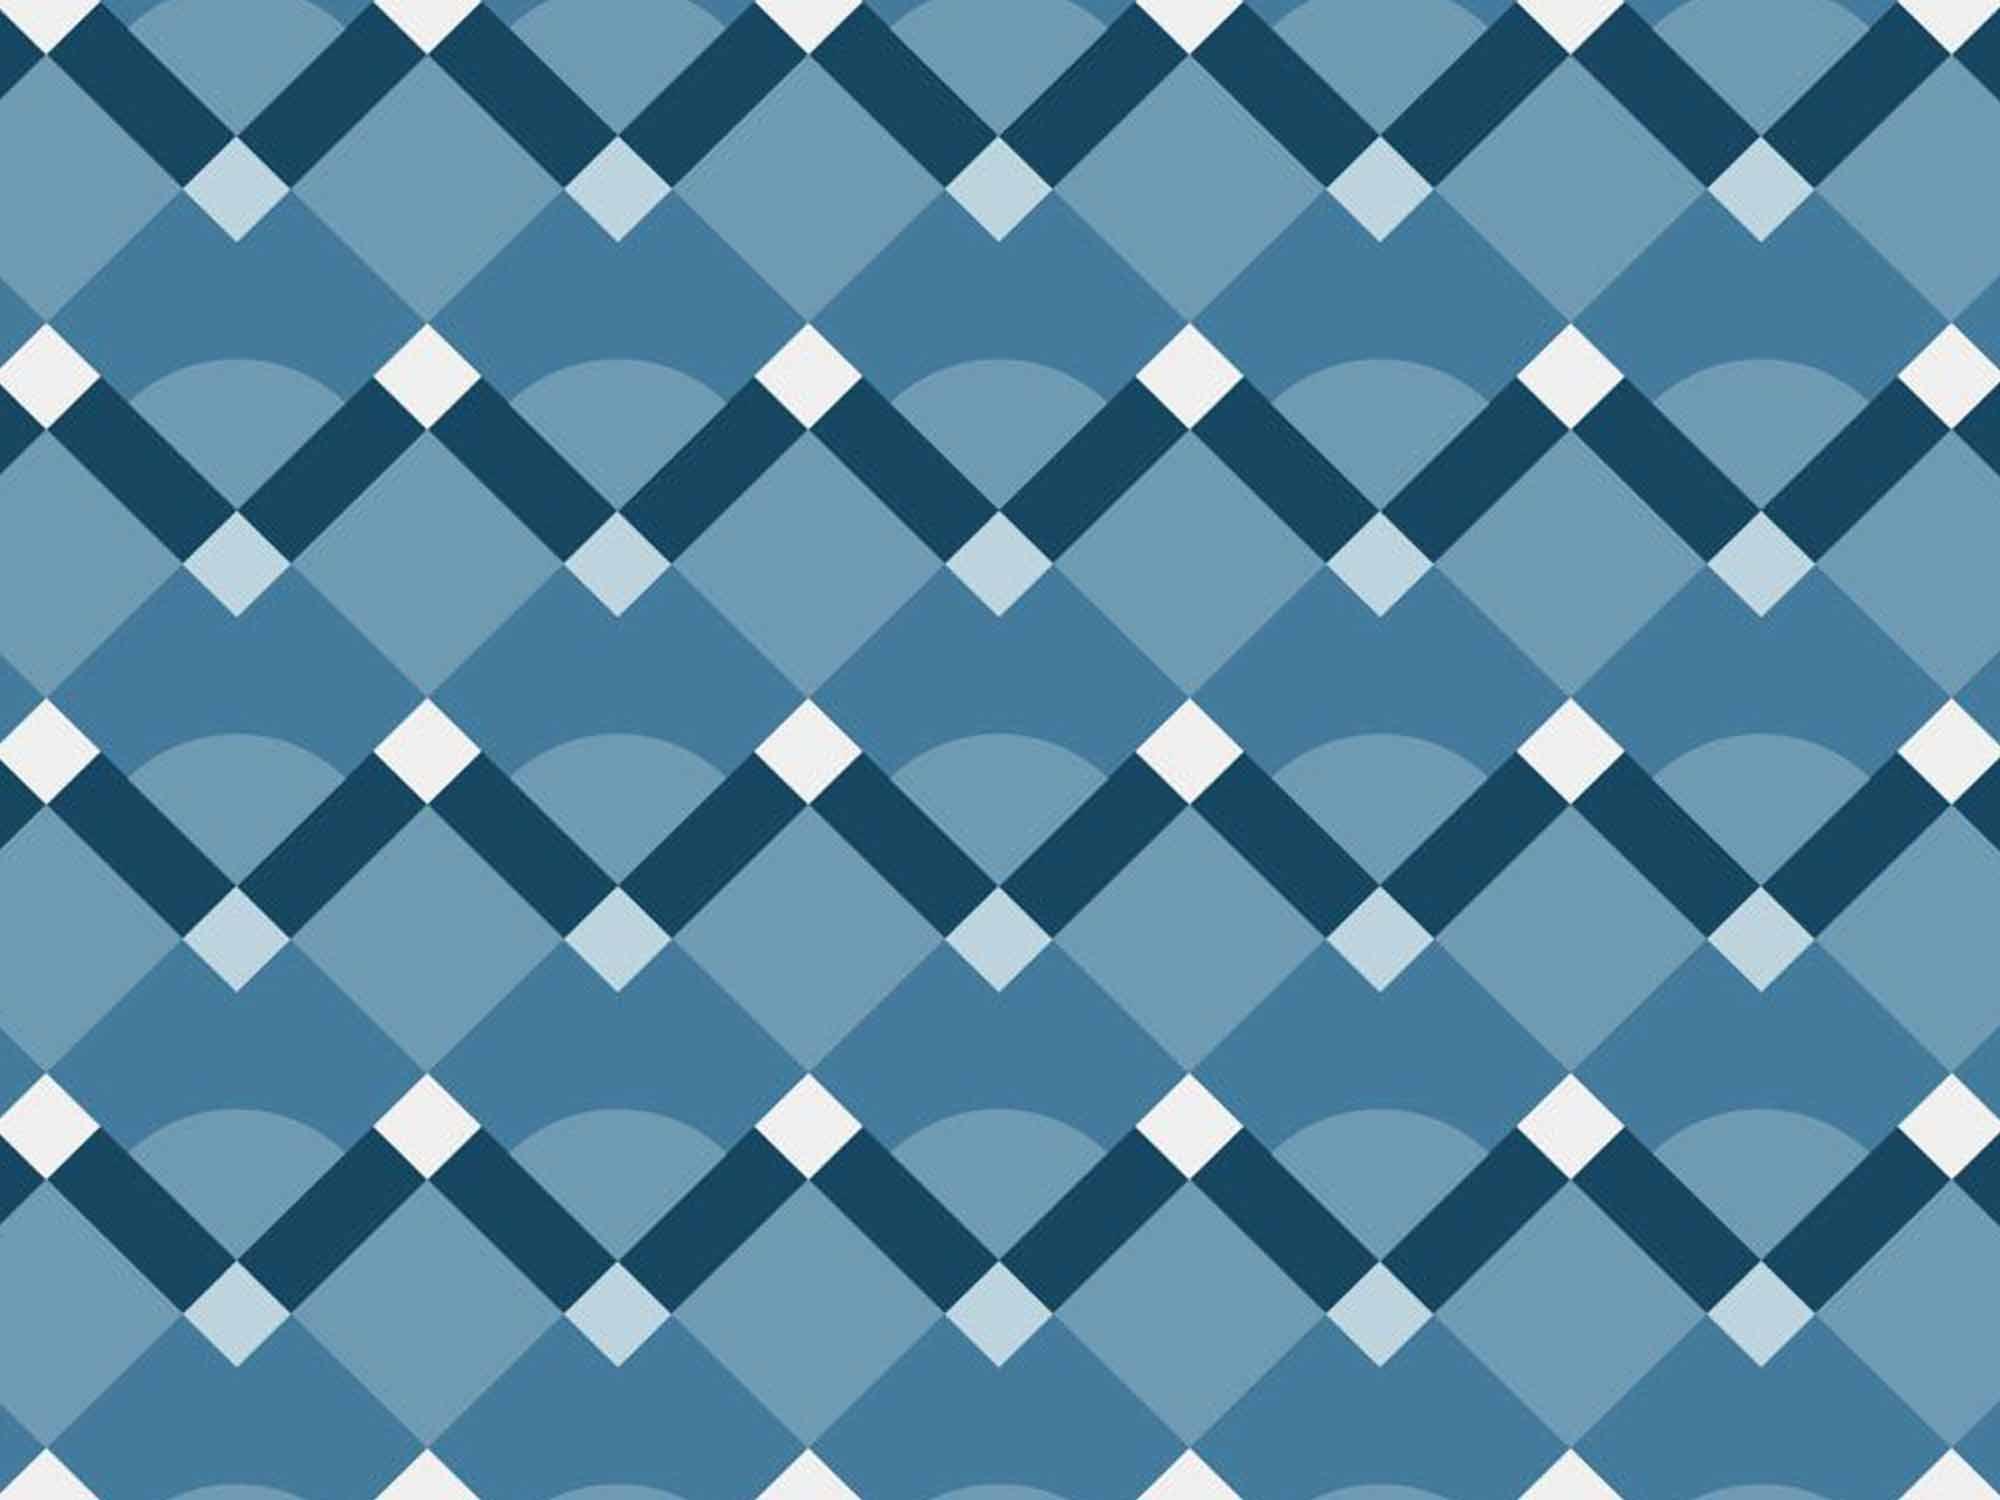 Papel de Parede para Sala Geométrico 0058 - Adesivos de Parede  - Paredes Decoradas